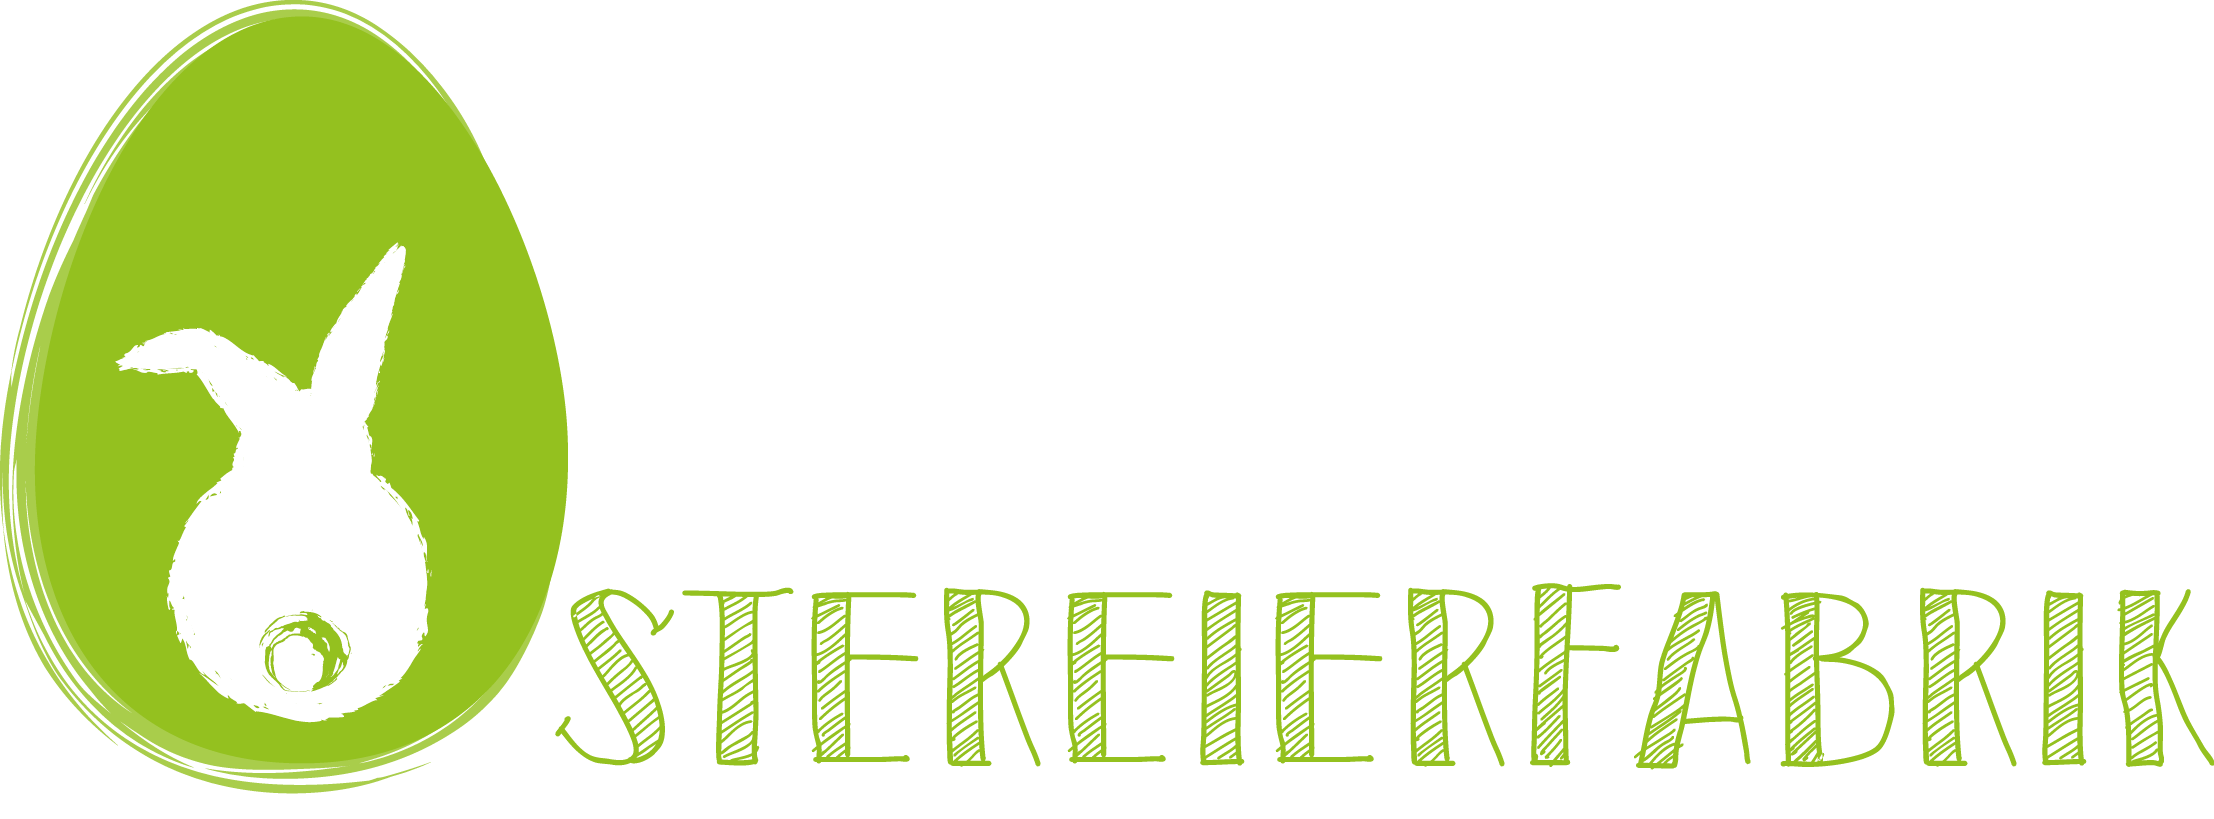 Ostereier-Shop der Fa. Karl GmbH-Logo